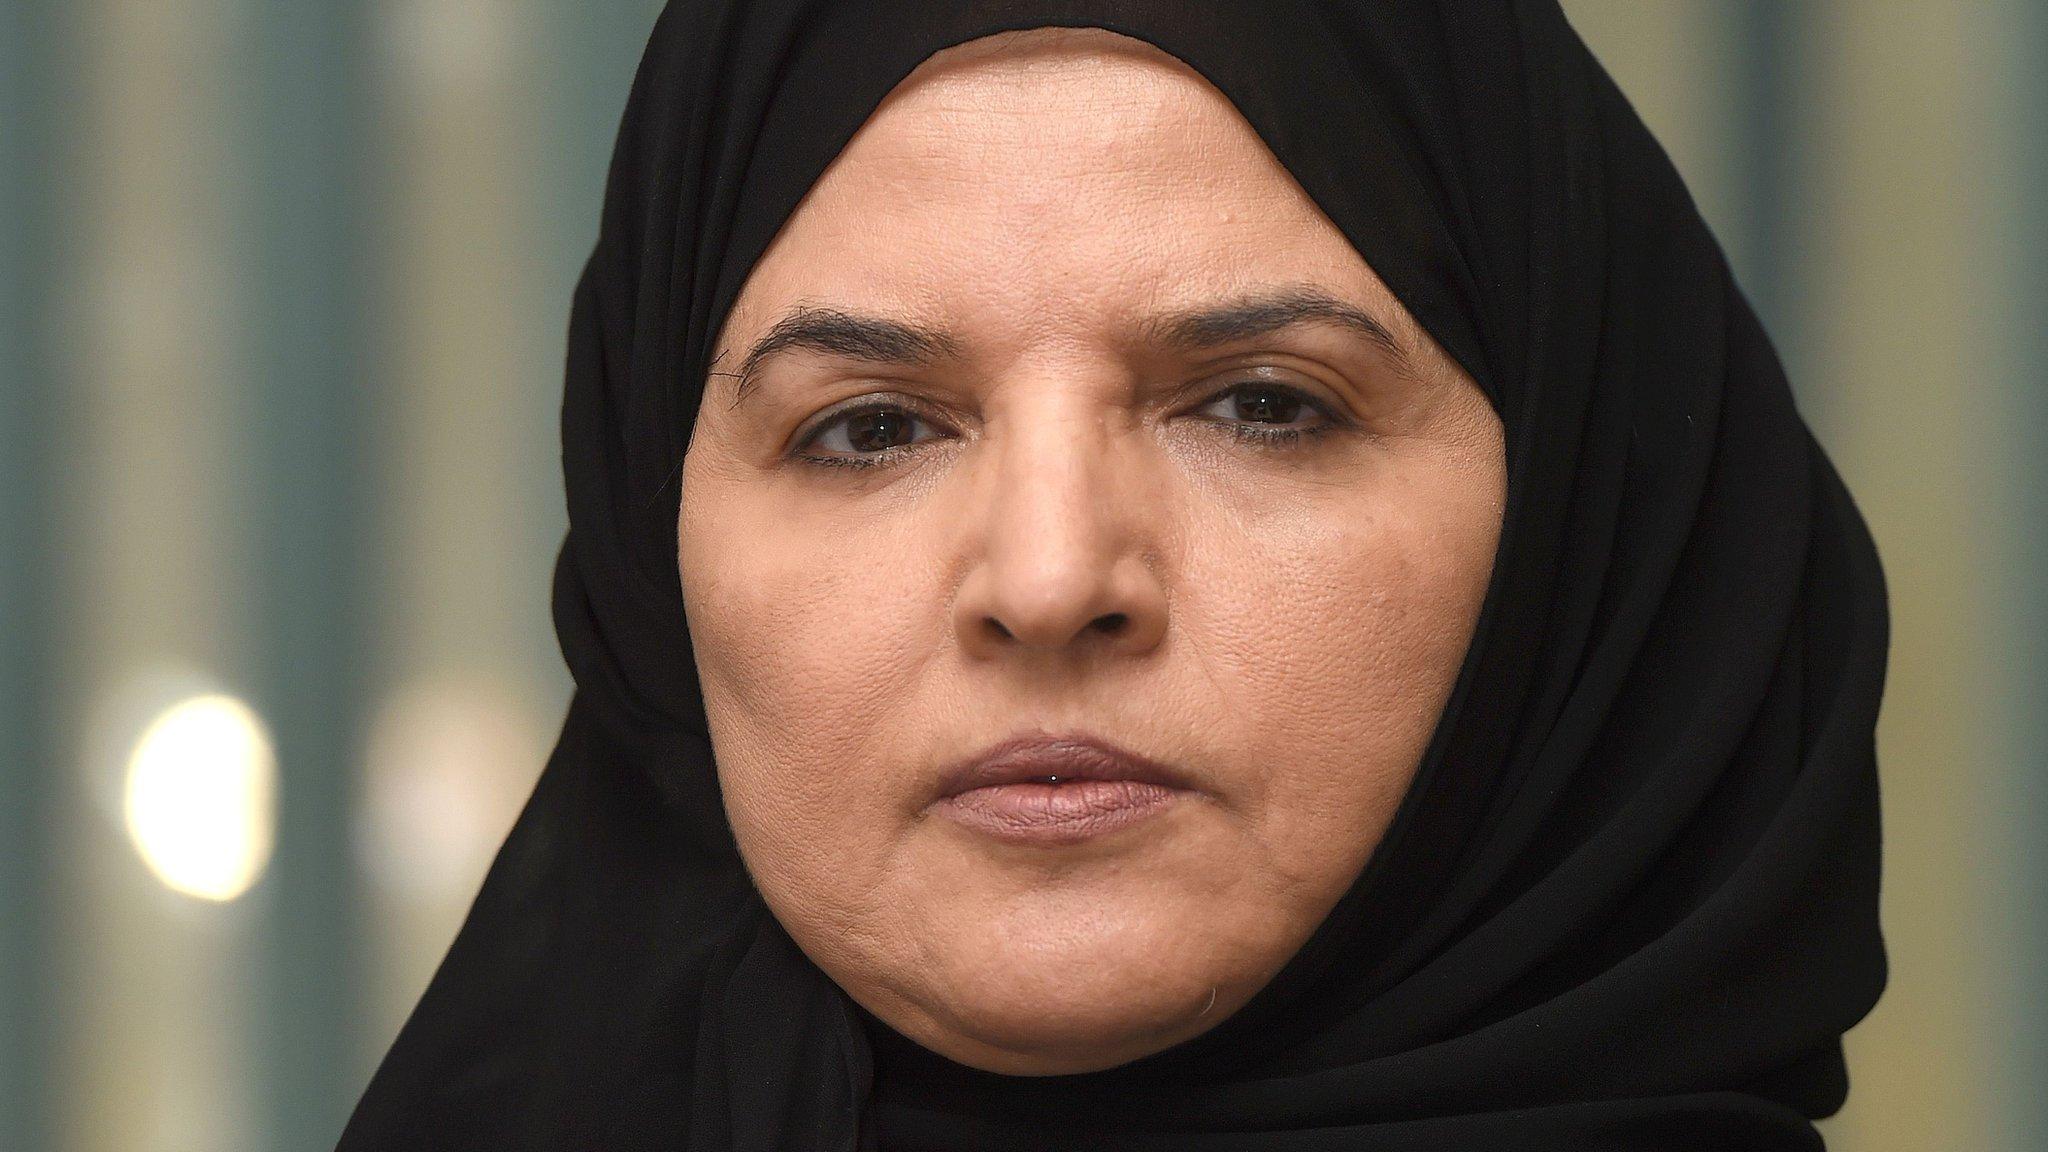 Saudi Arabia widens crackdown on women's rights activists